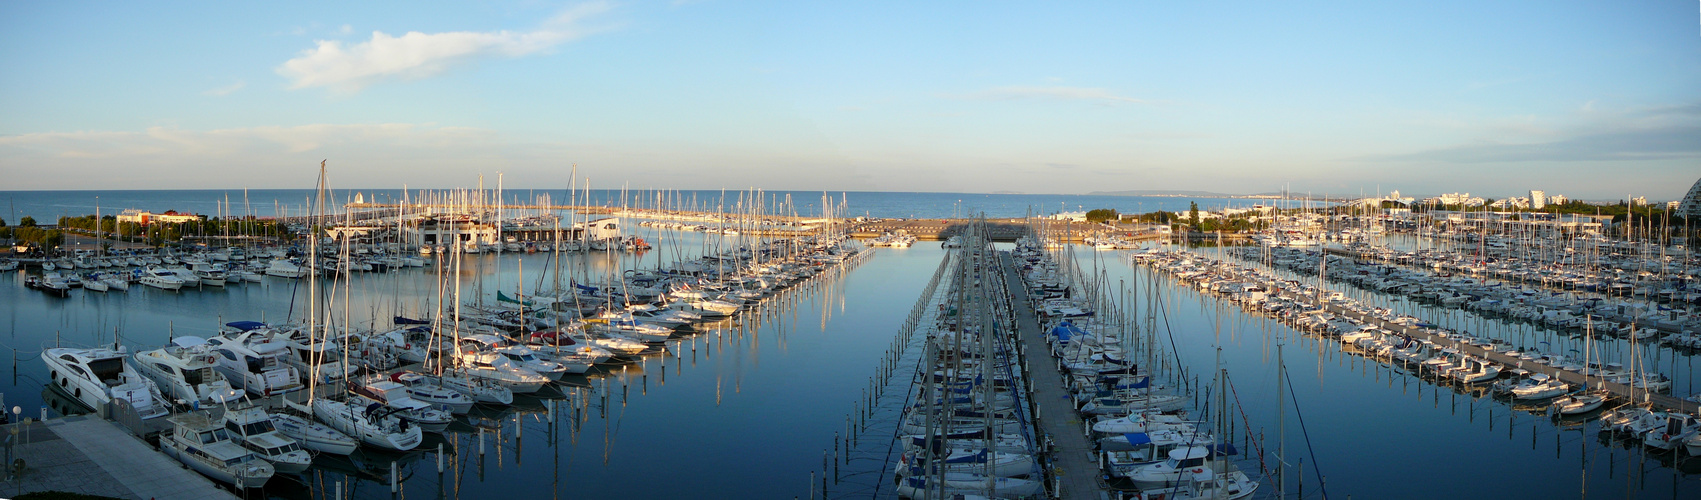 Mittelmeerhafen